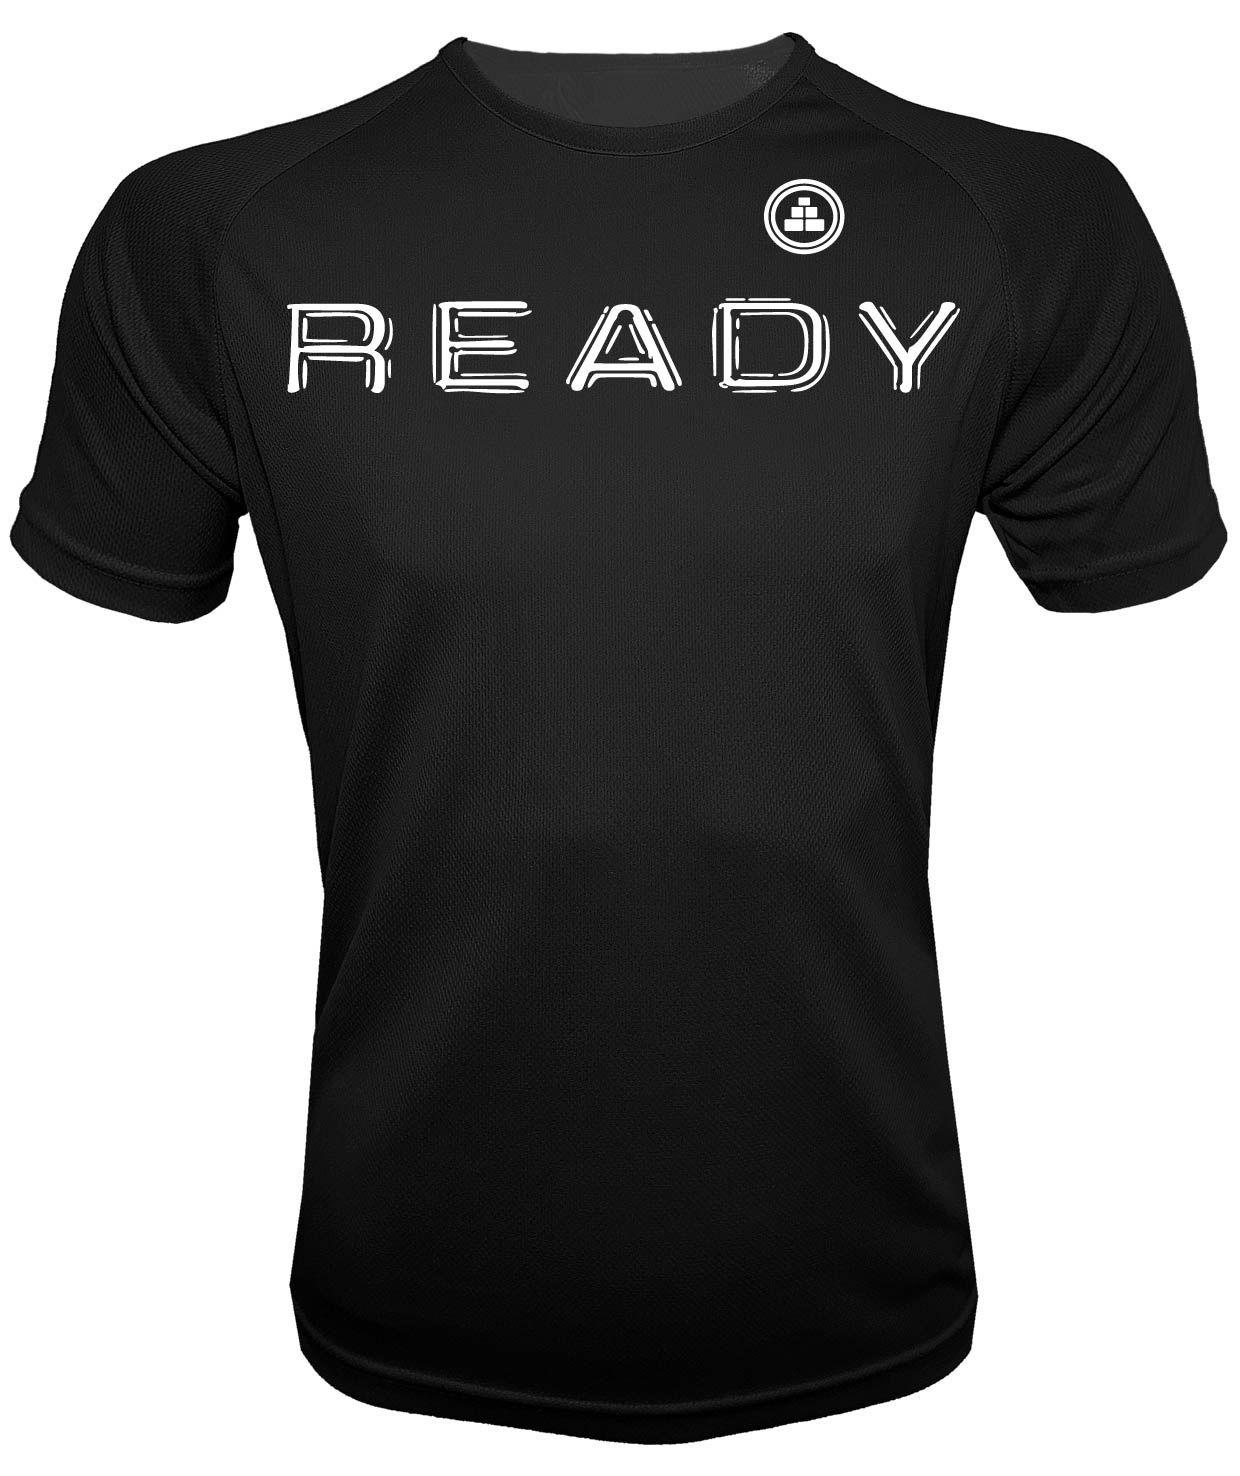 Camiseta de deporte Ready N